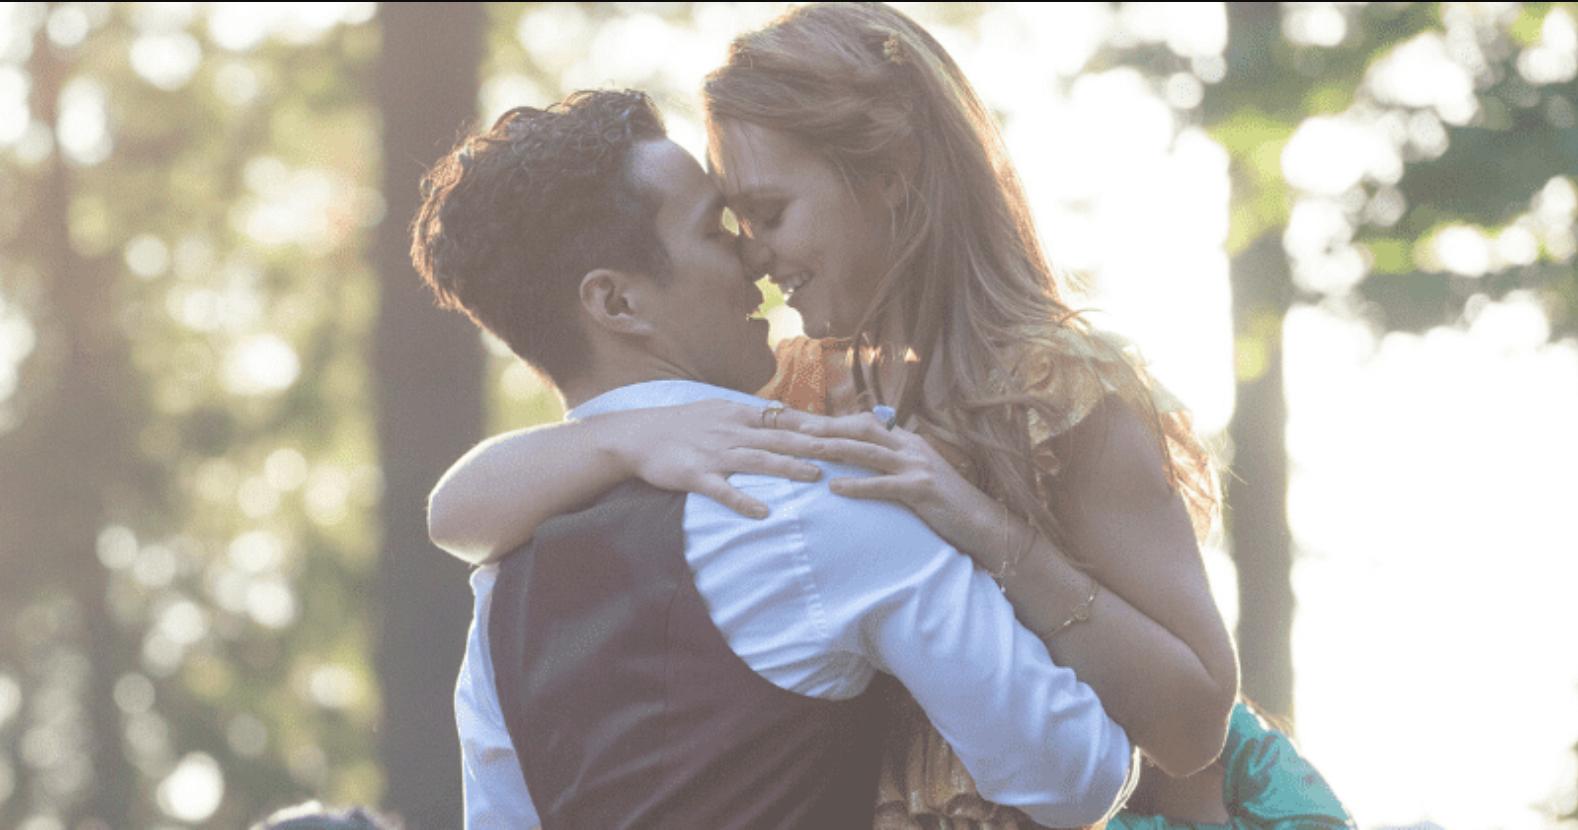 EXCLUSIVE INTERVIEW: 'Motherland: Fort Salem' Kai Bradbury Talks Romance & Representation